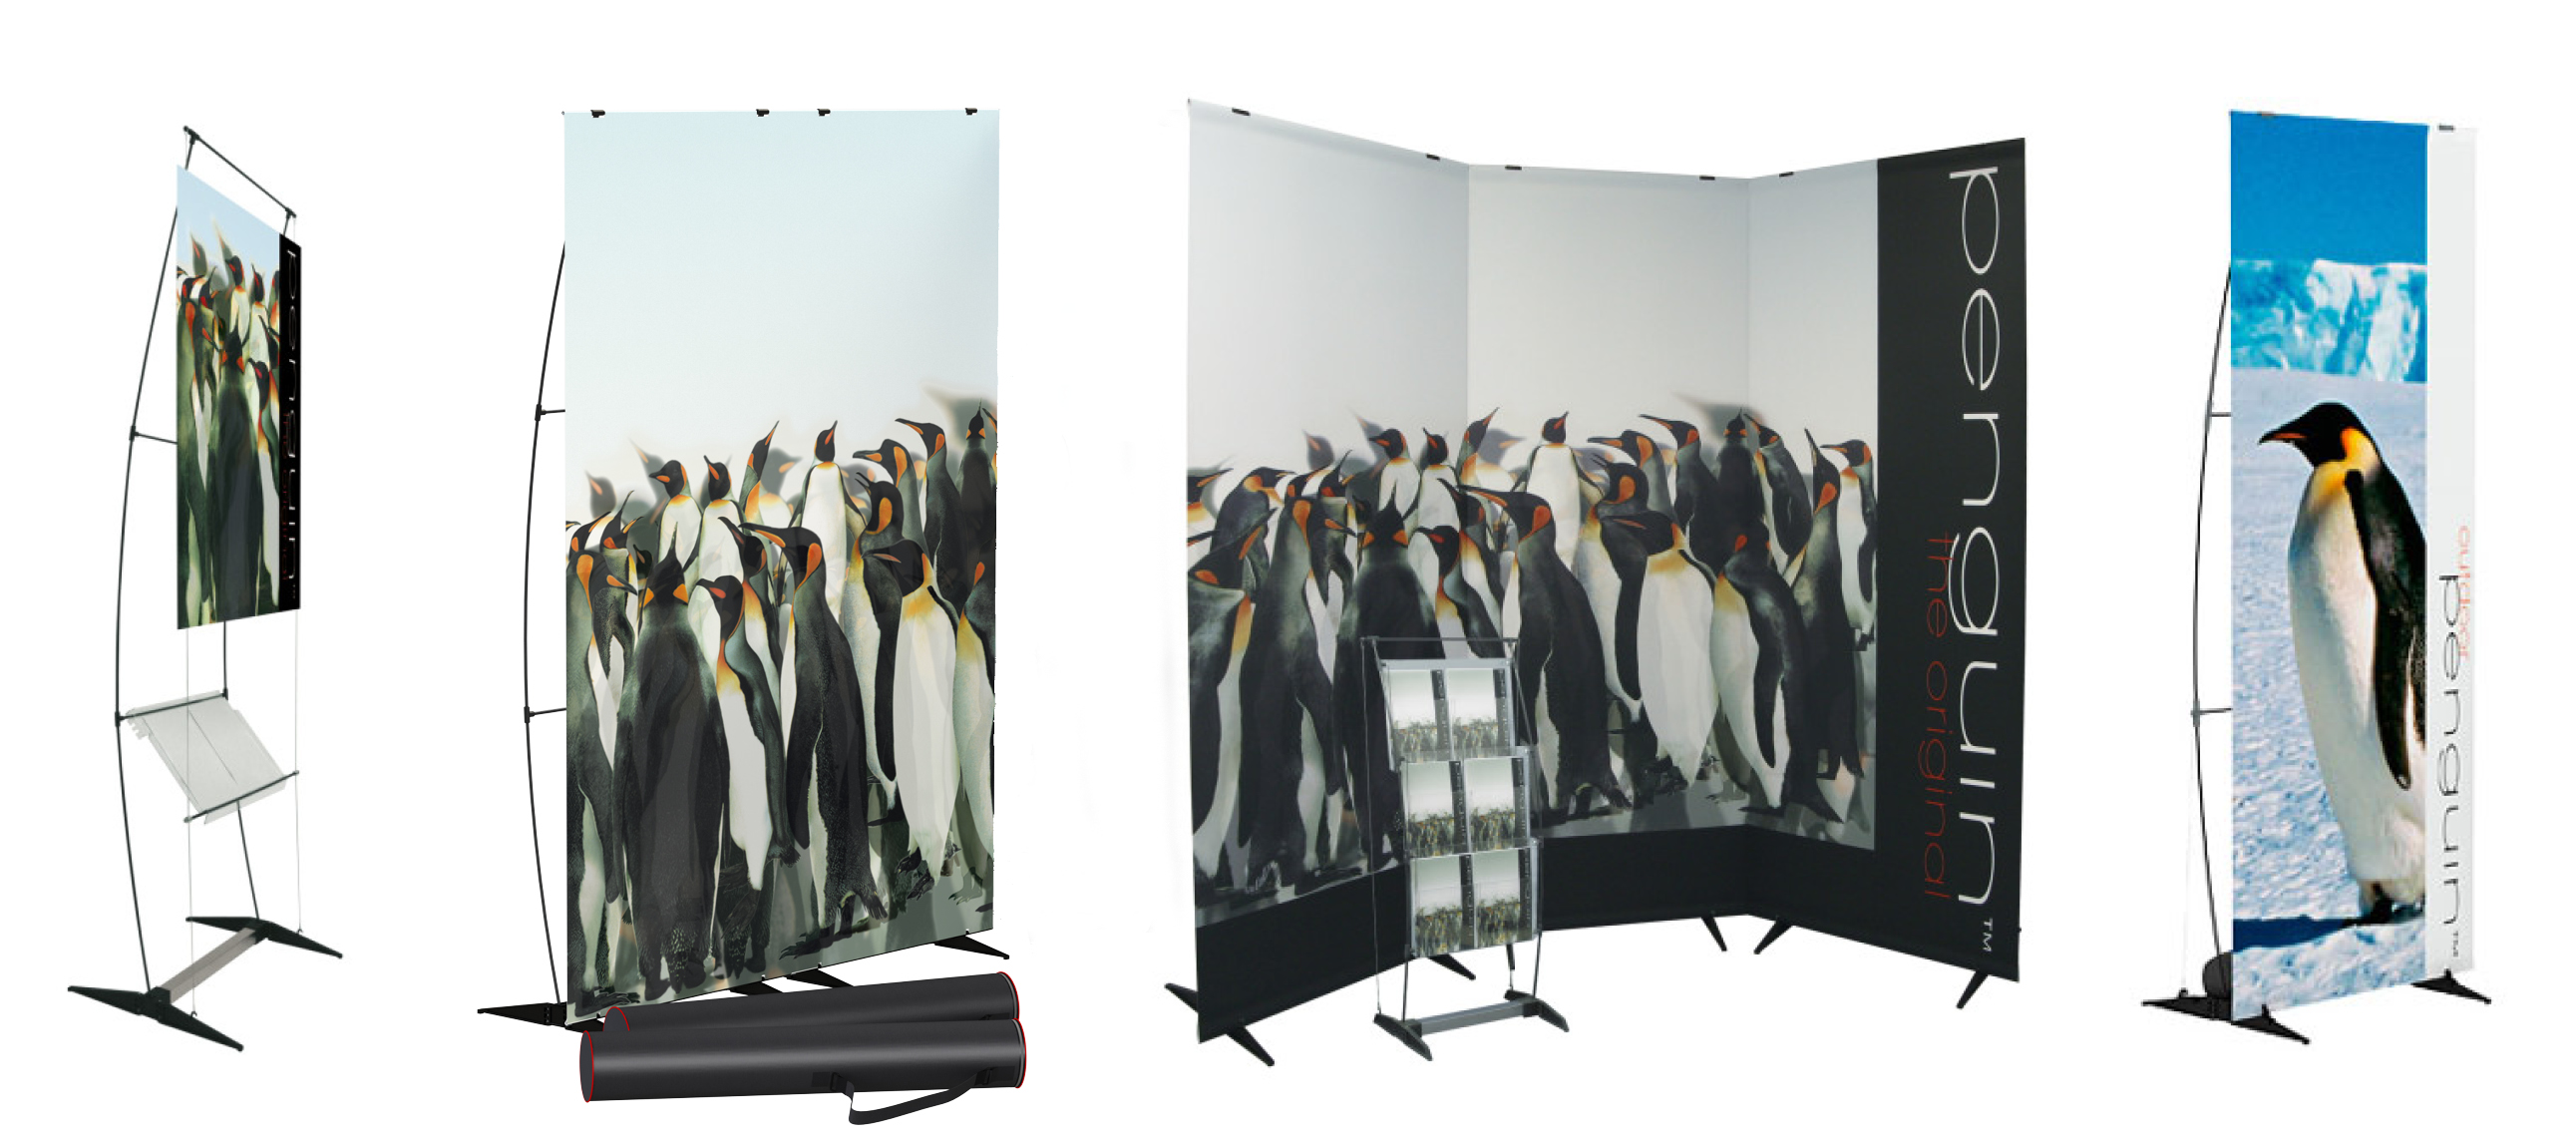 Read more about the article penguin: Das multifunktionale Displaysystem für die flexible Präsentation